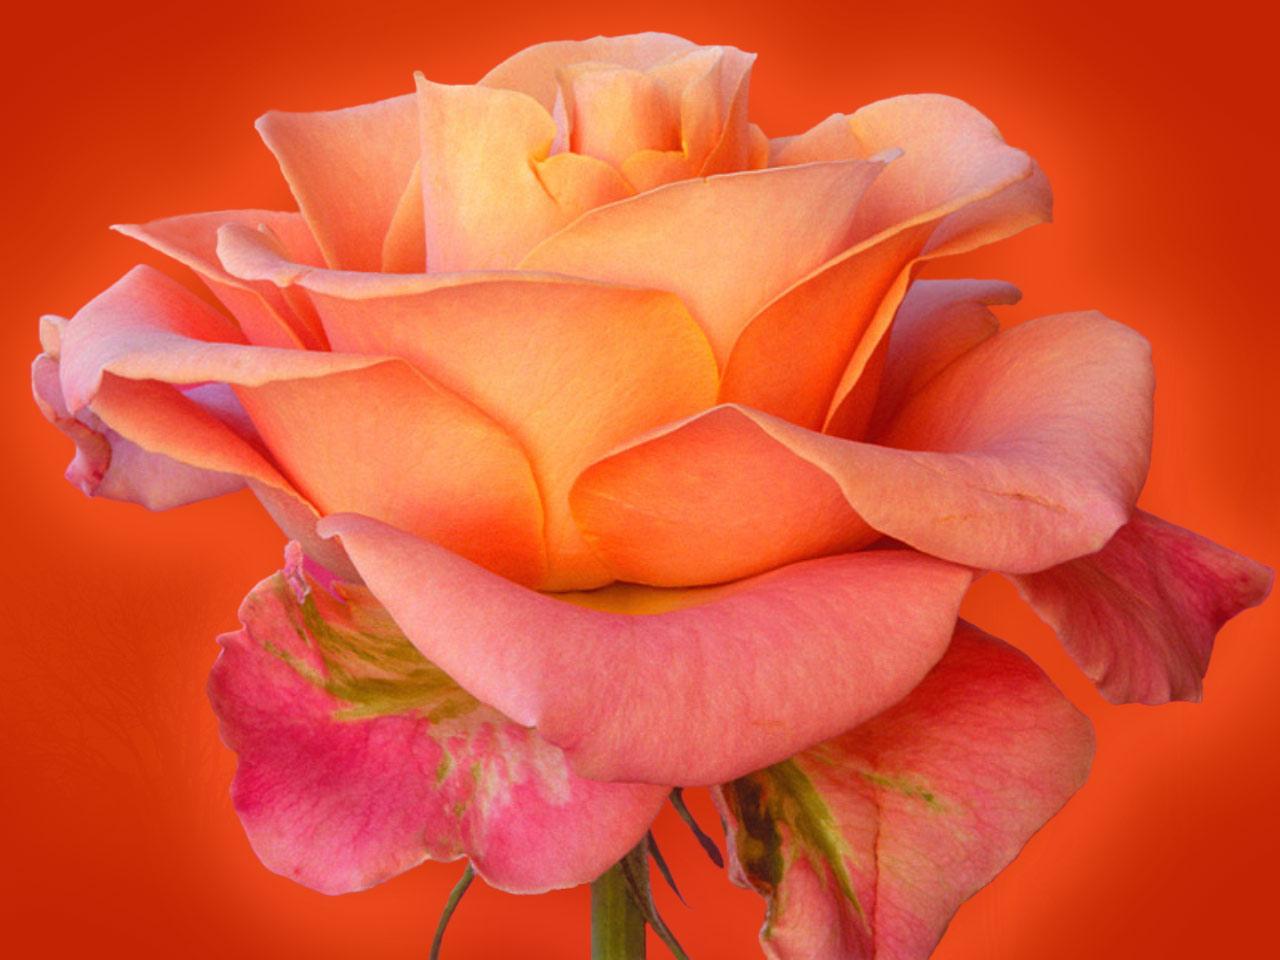 rose wallpapers rose wallpaper beauty rose wallpaper red rose 1280x960